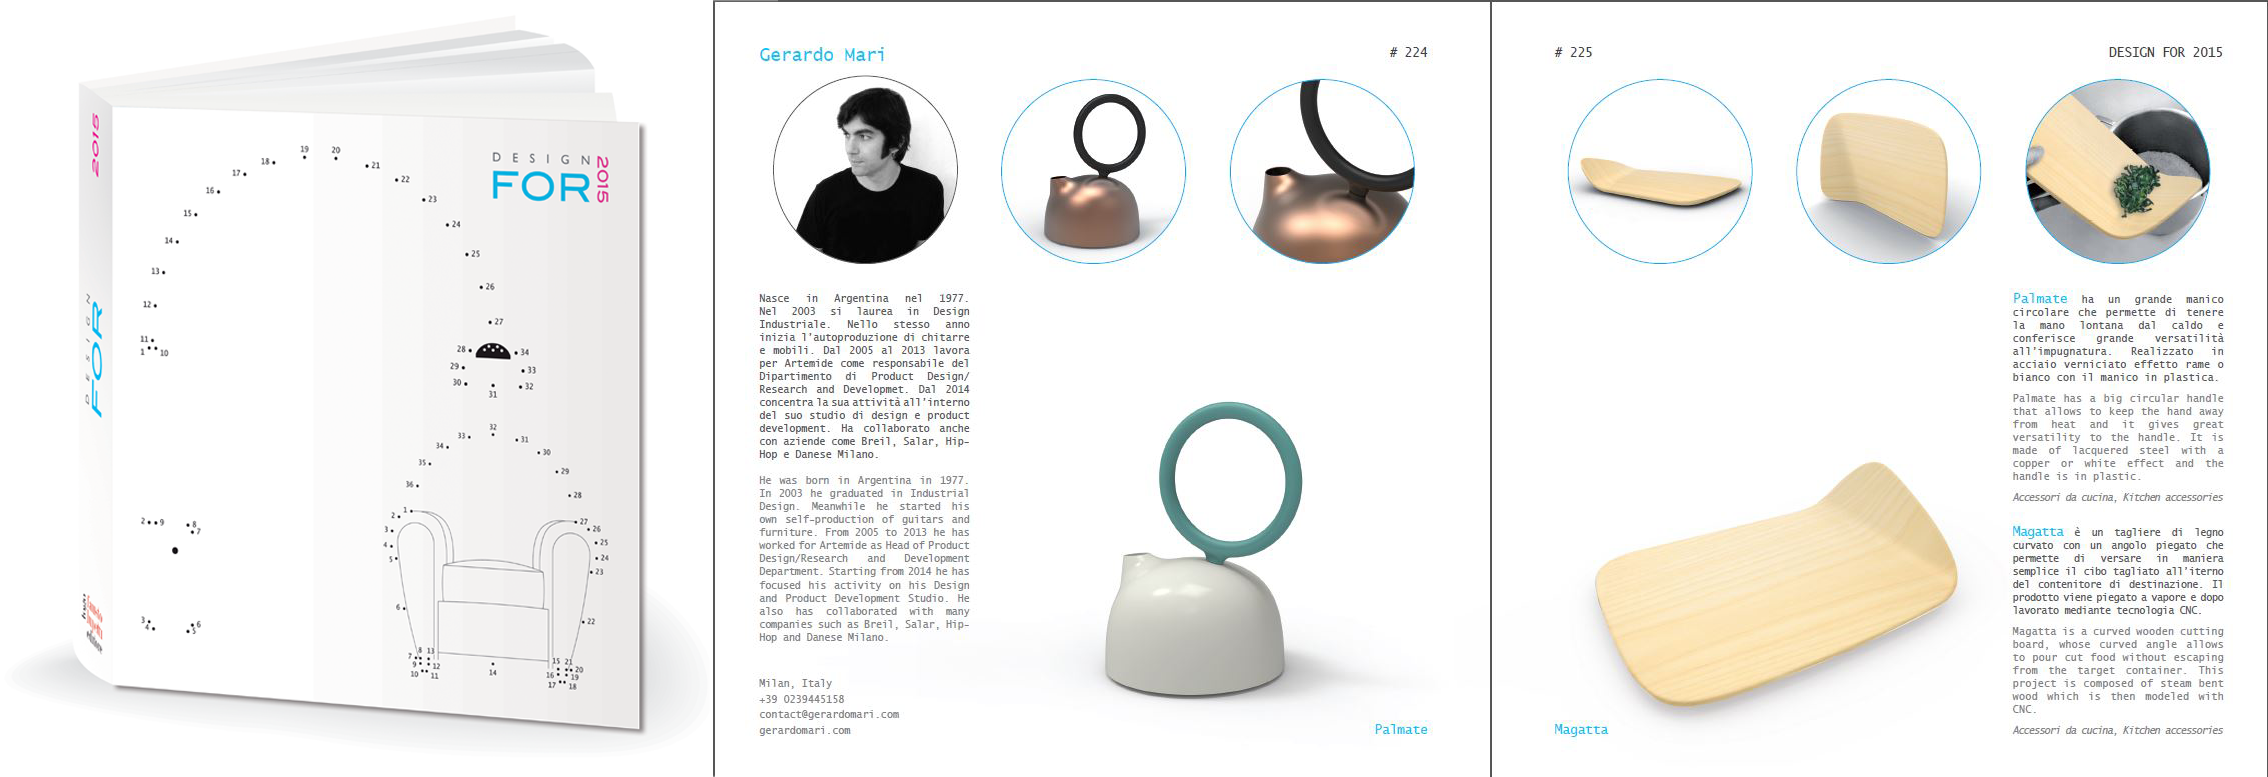 Design for 2015 - February 2015 - Italy - Palmate - Nagatta